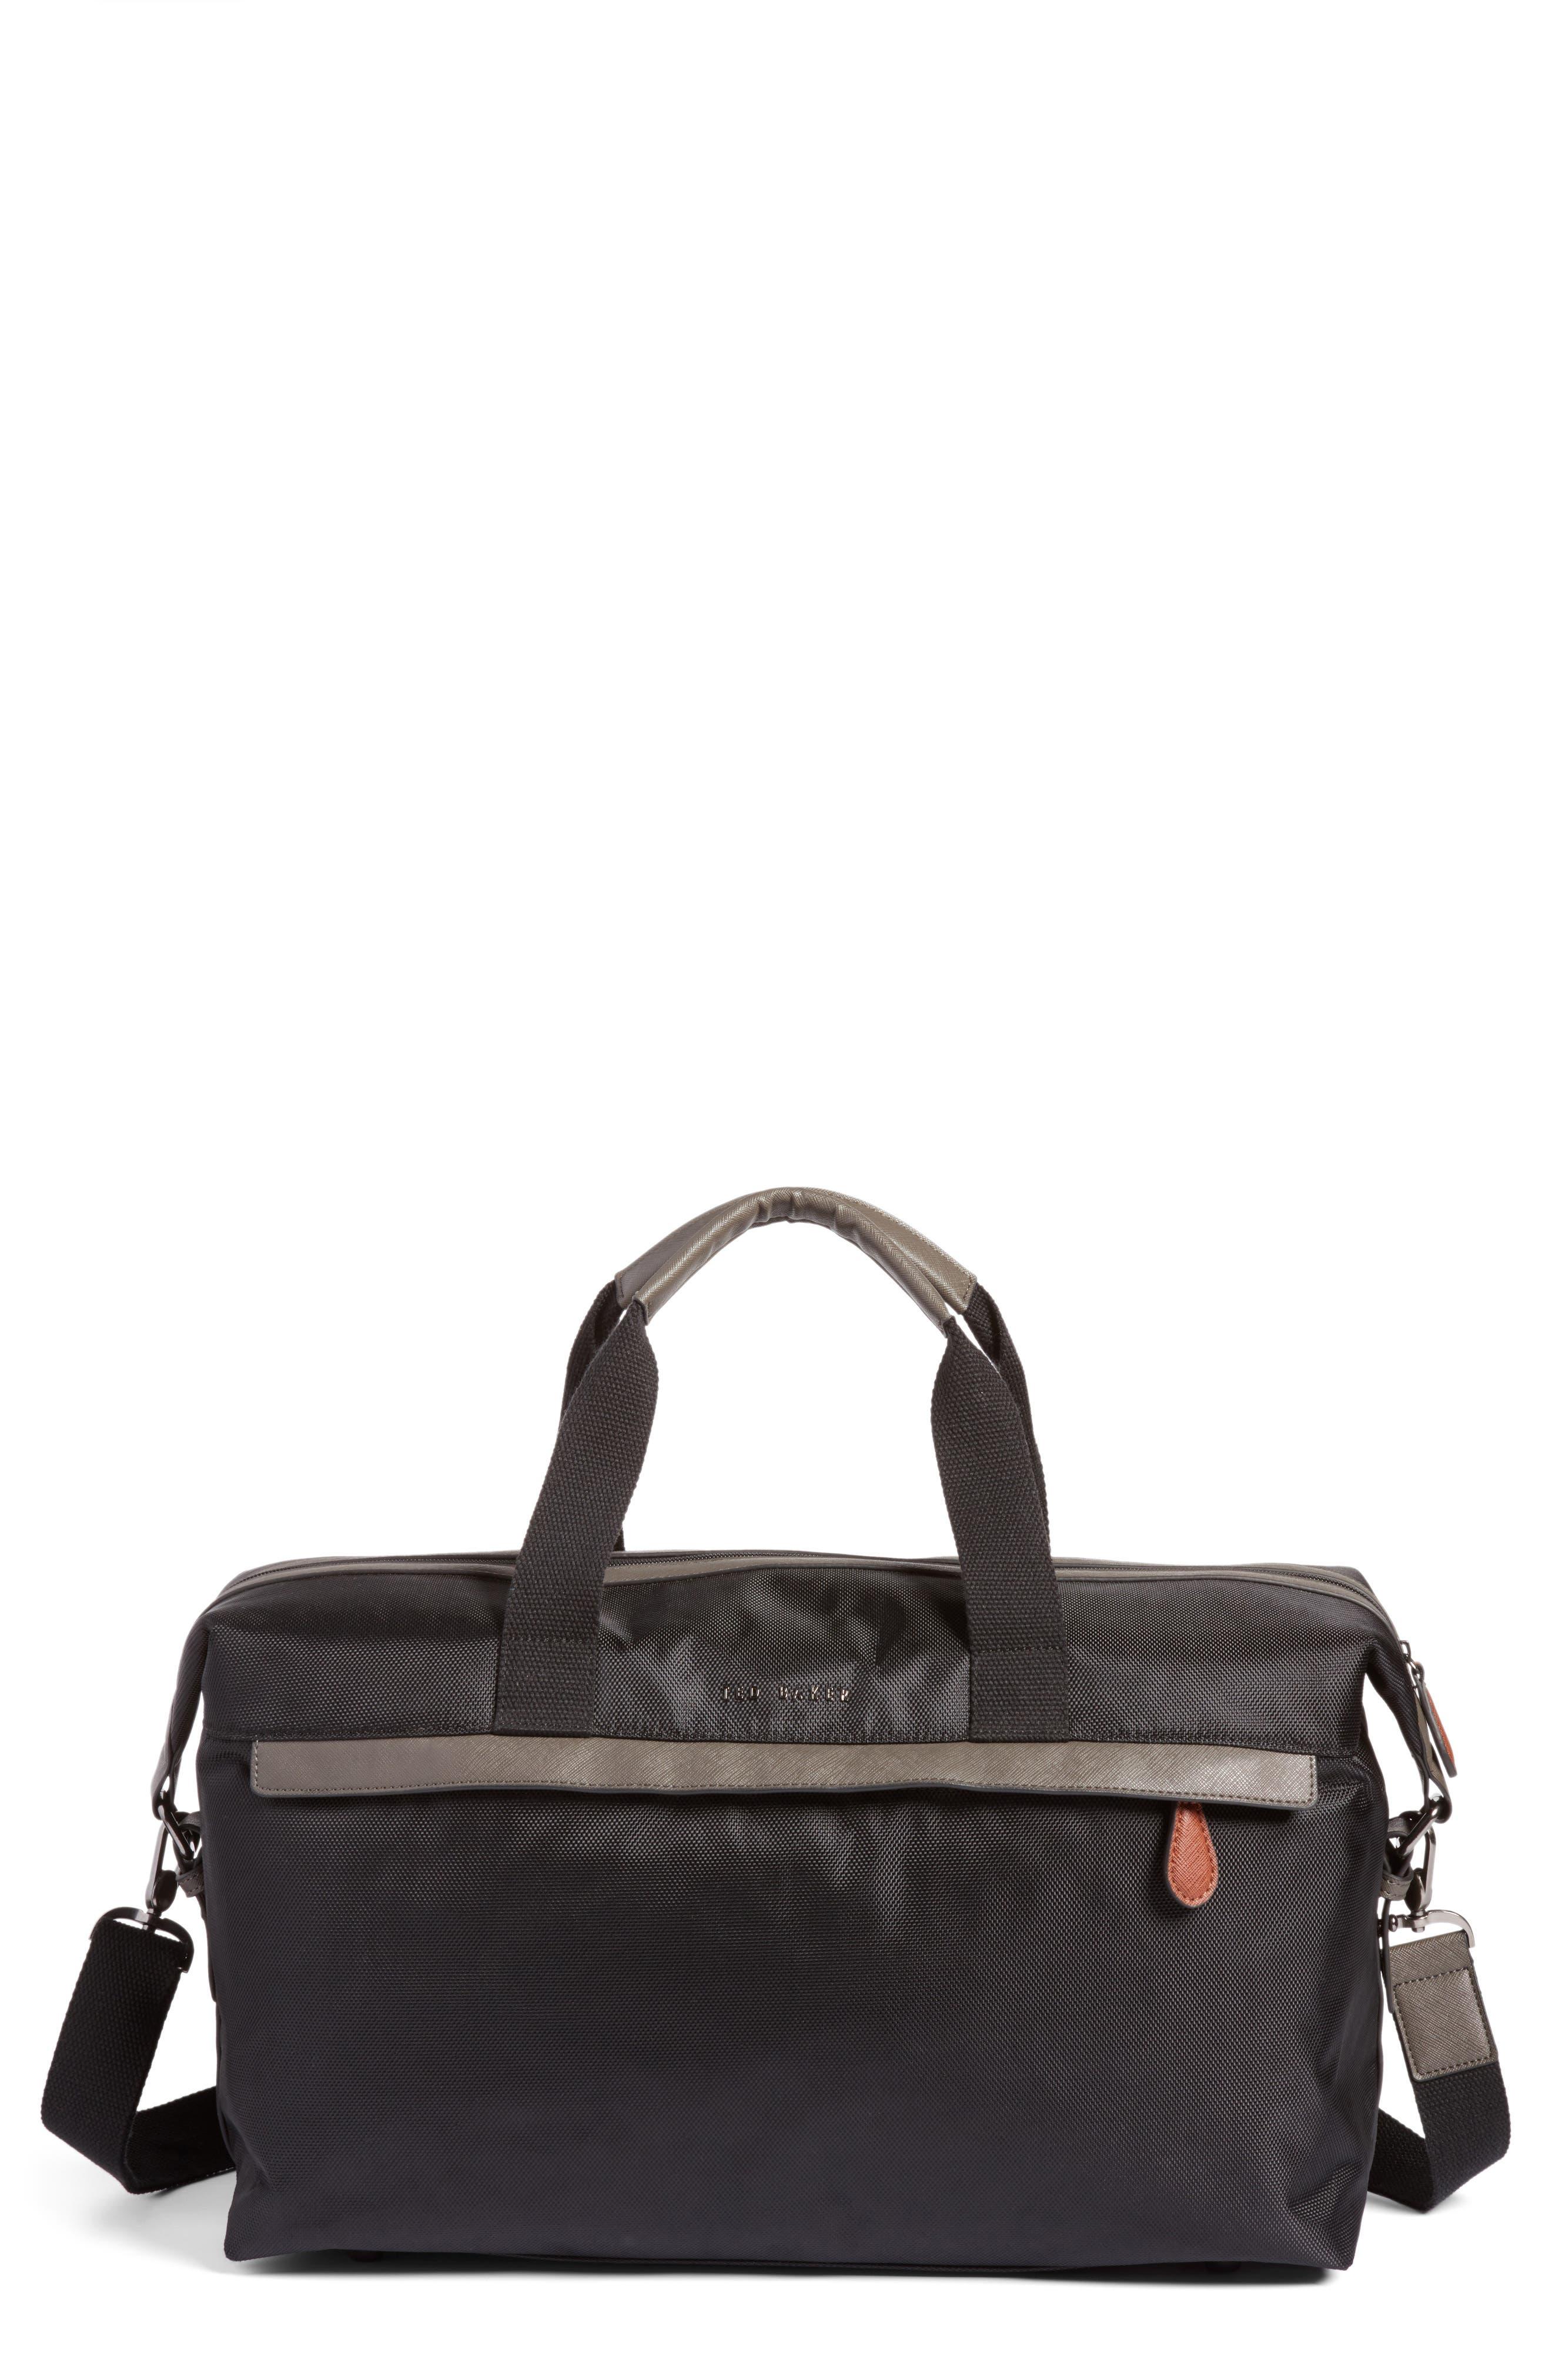 Zeebee Duffel Bag,                         Main,                         color, Black